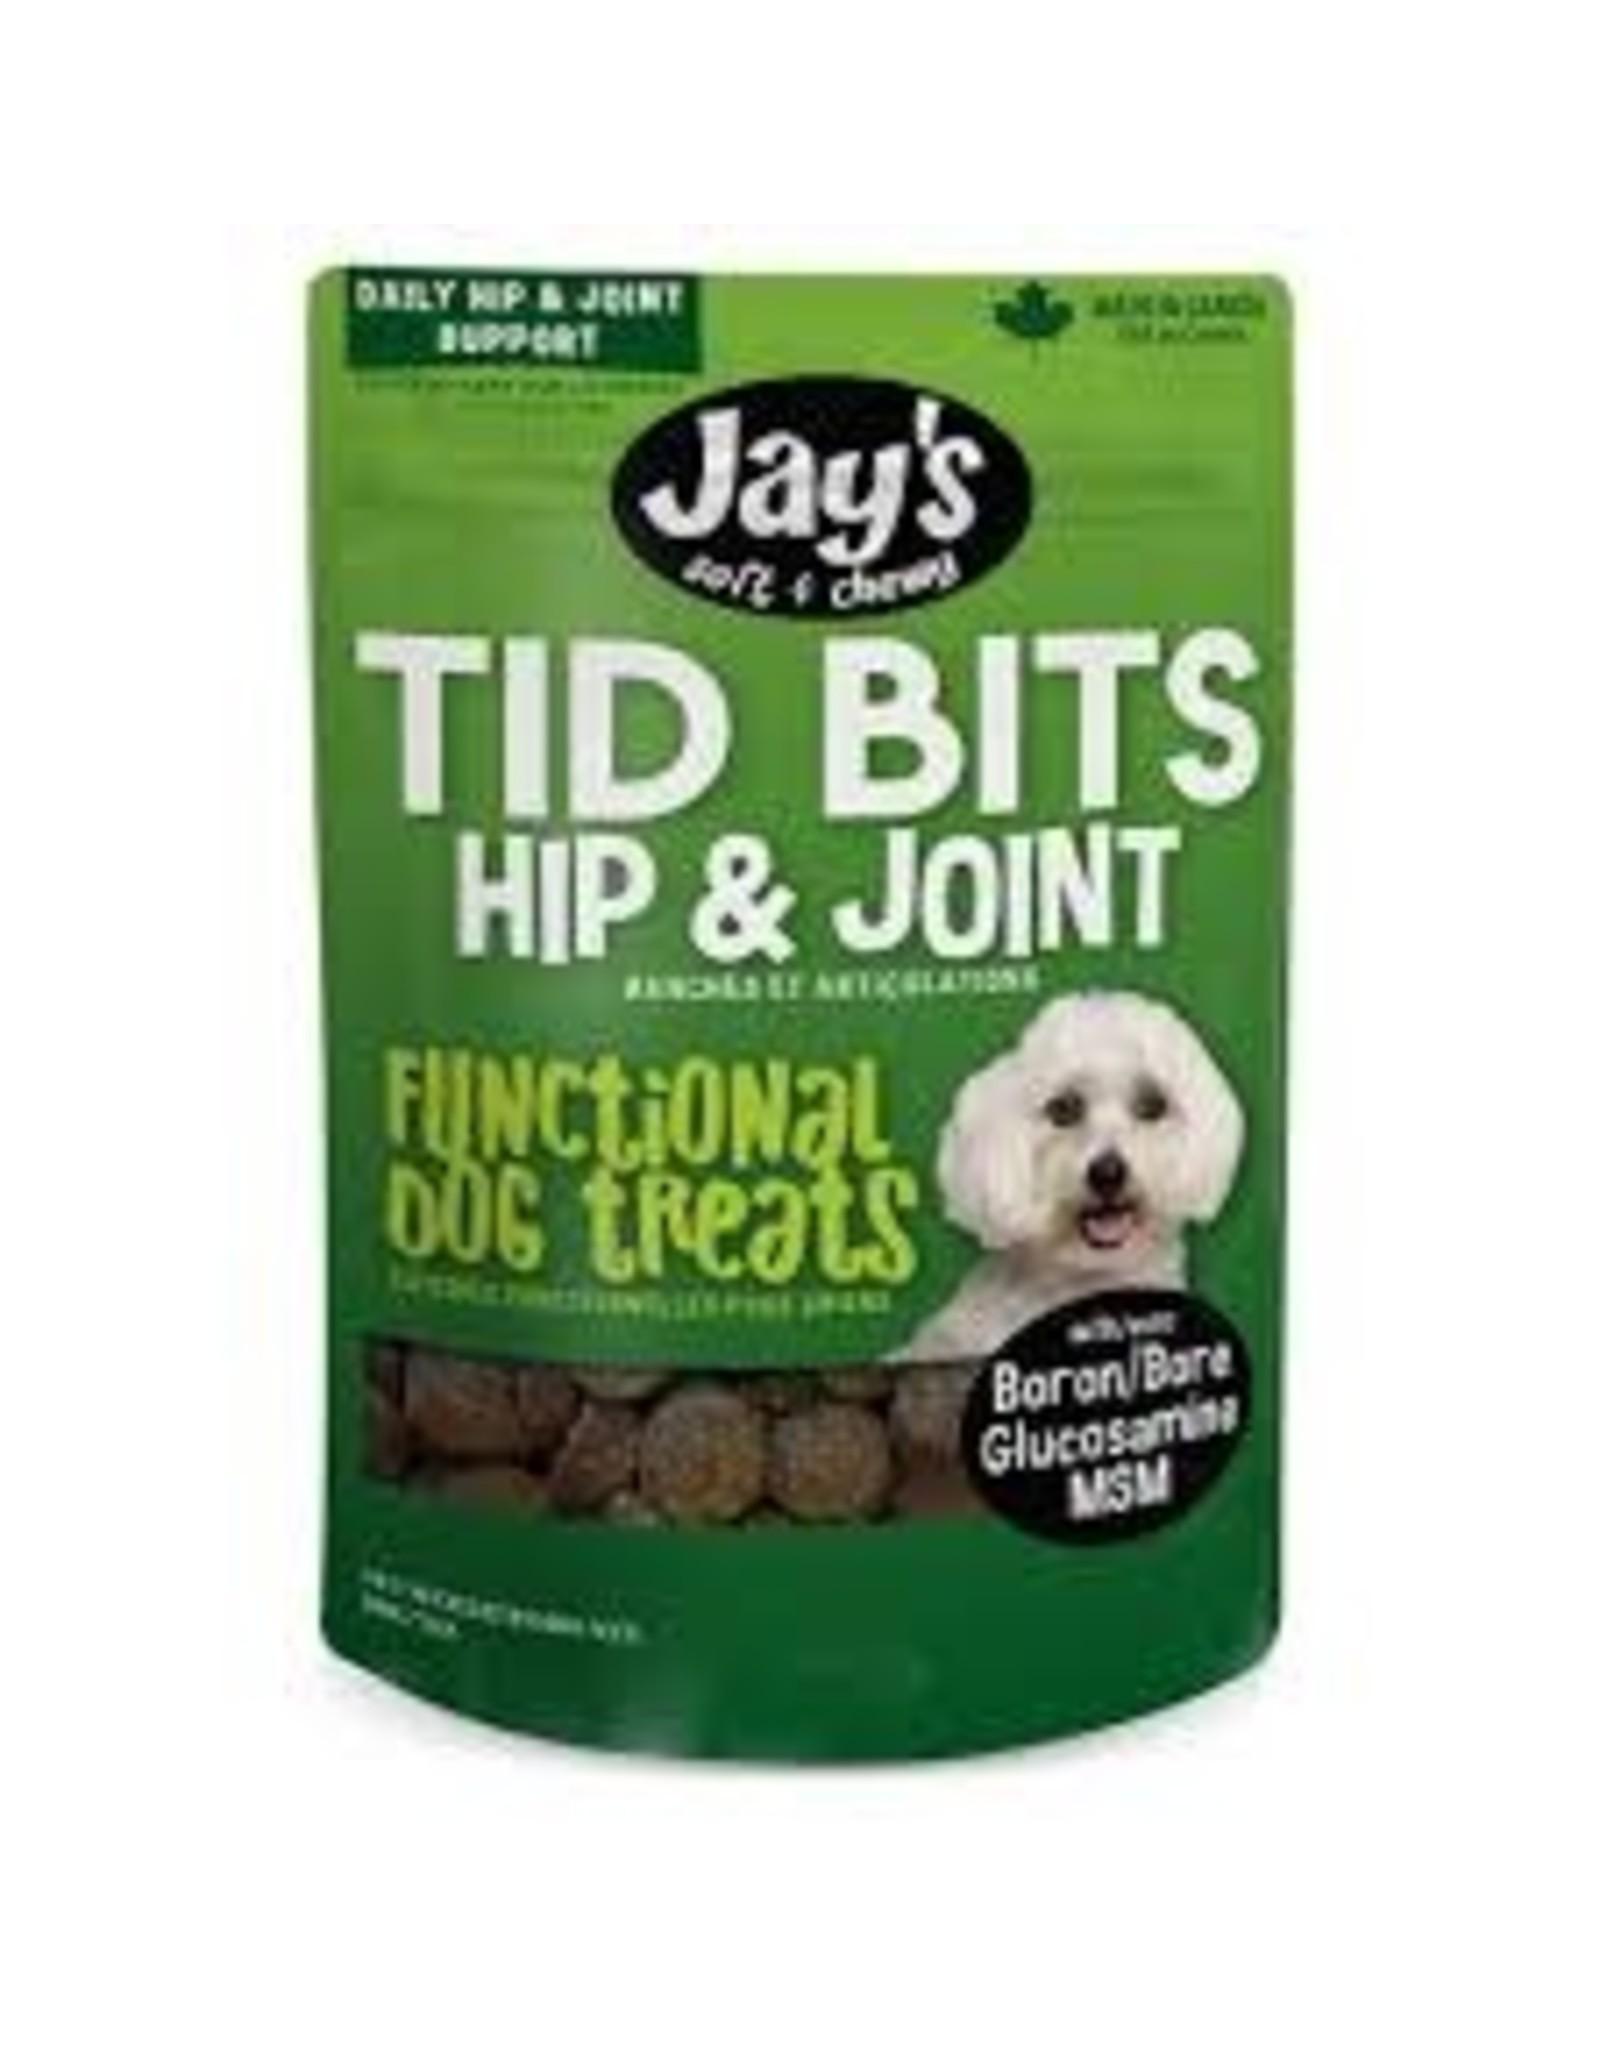 Jay's Jay's - Tid Bits Hip & Joint 200g